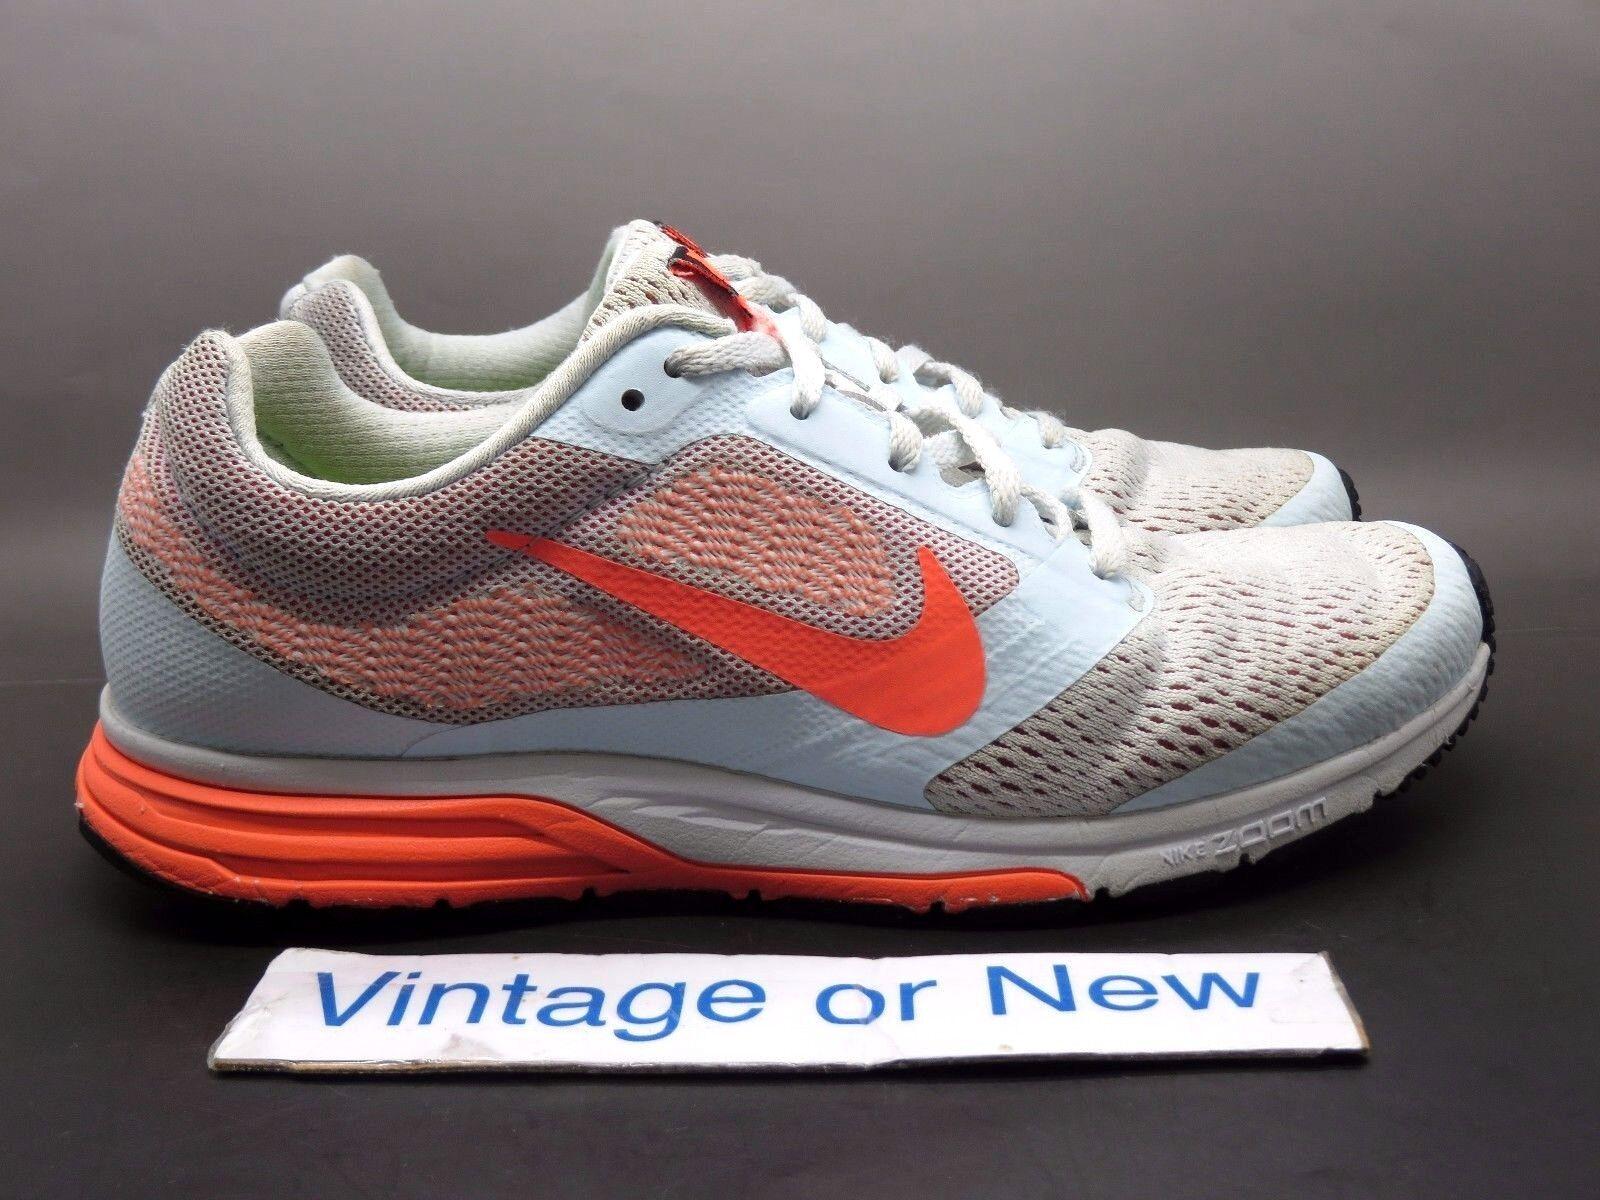 Women's Nike Air Zoom Fly 2 Blue Tint Orange Atomic Pink 707607-408 Price reduction Seasonal clearance sale